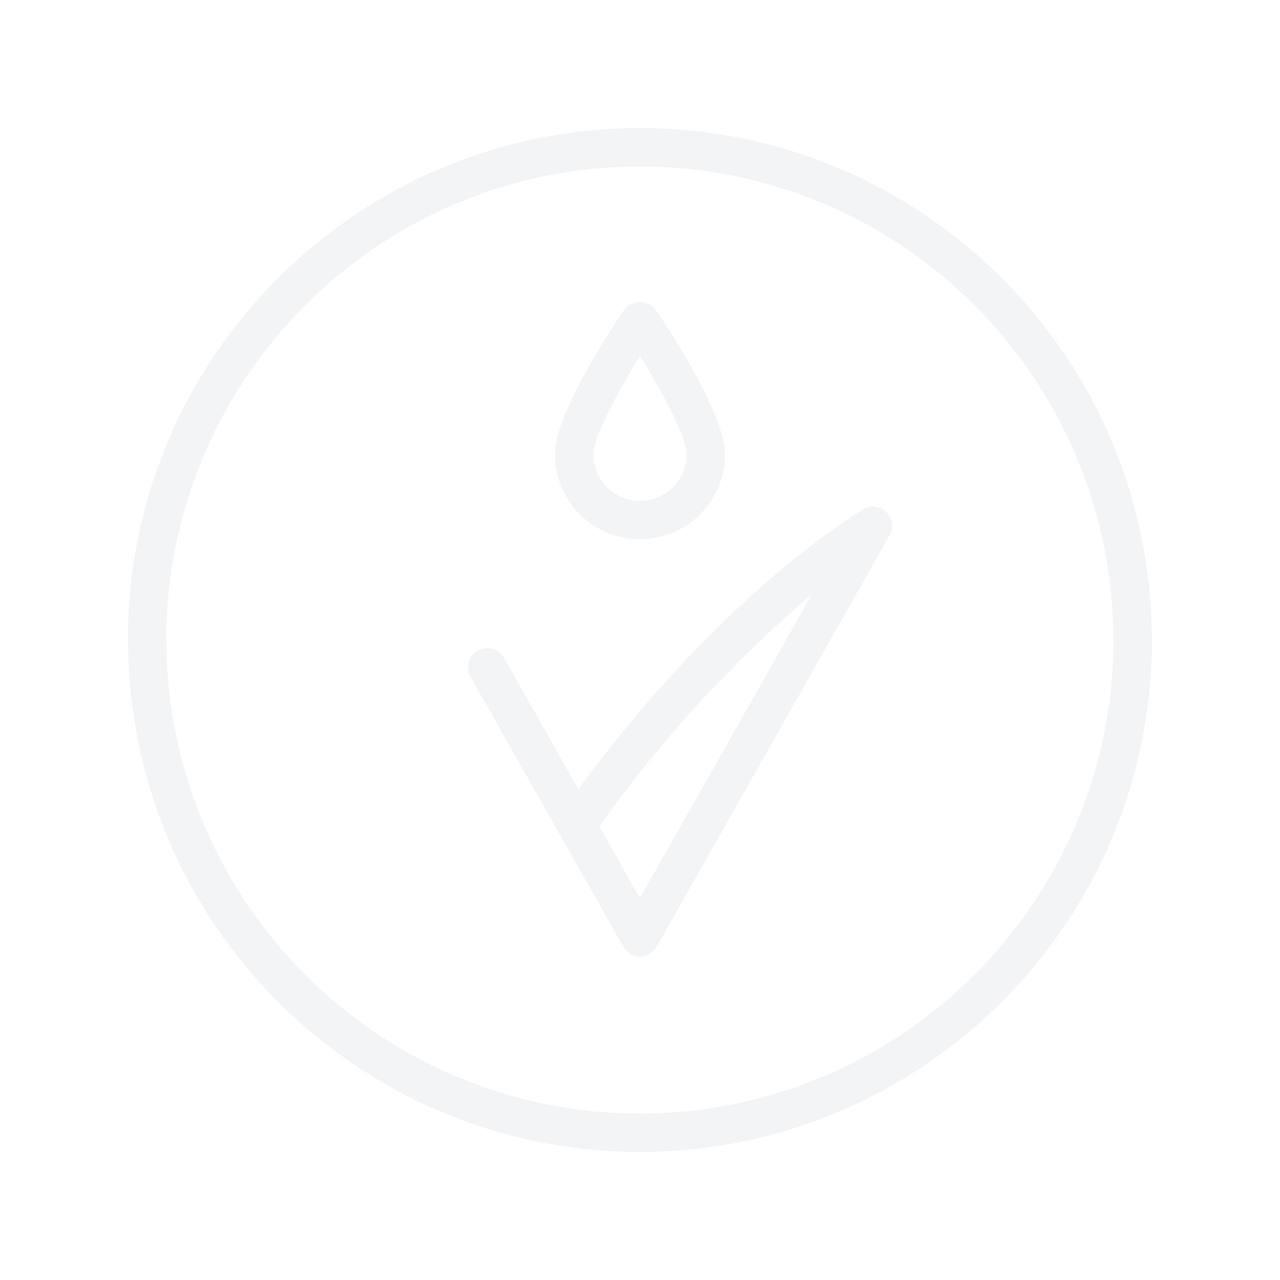 PUREDERM Dark Circle Reducer Eye Patches 6x2pcs